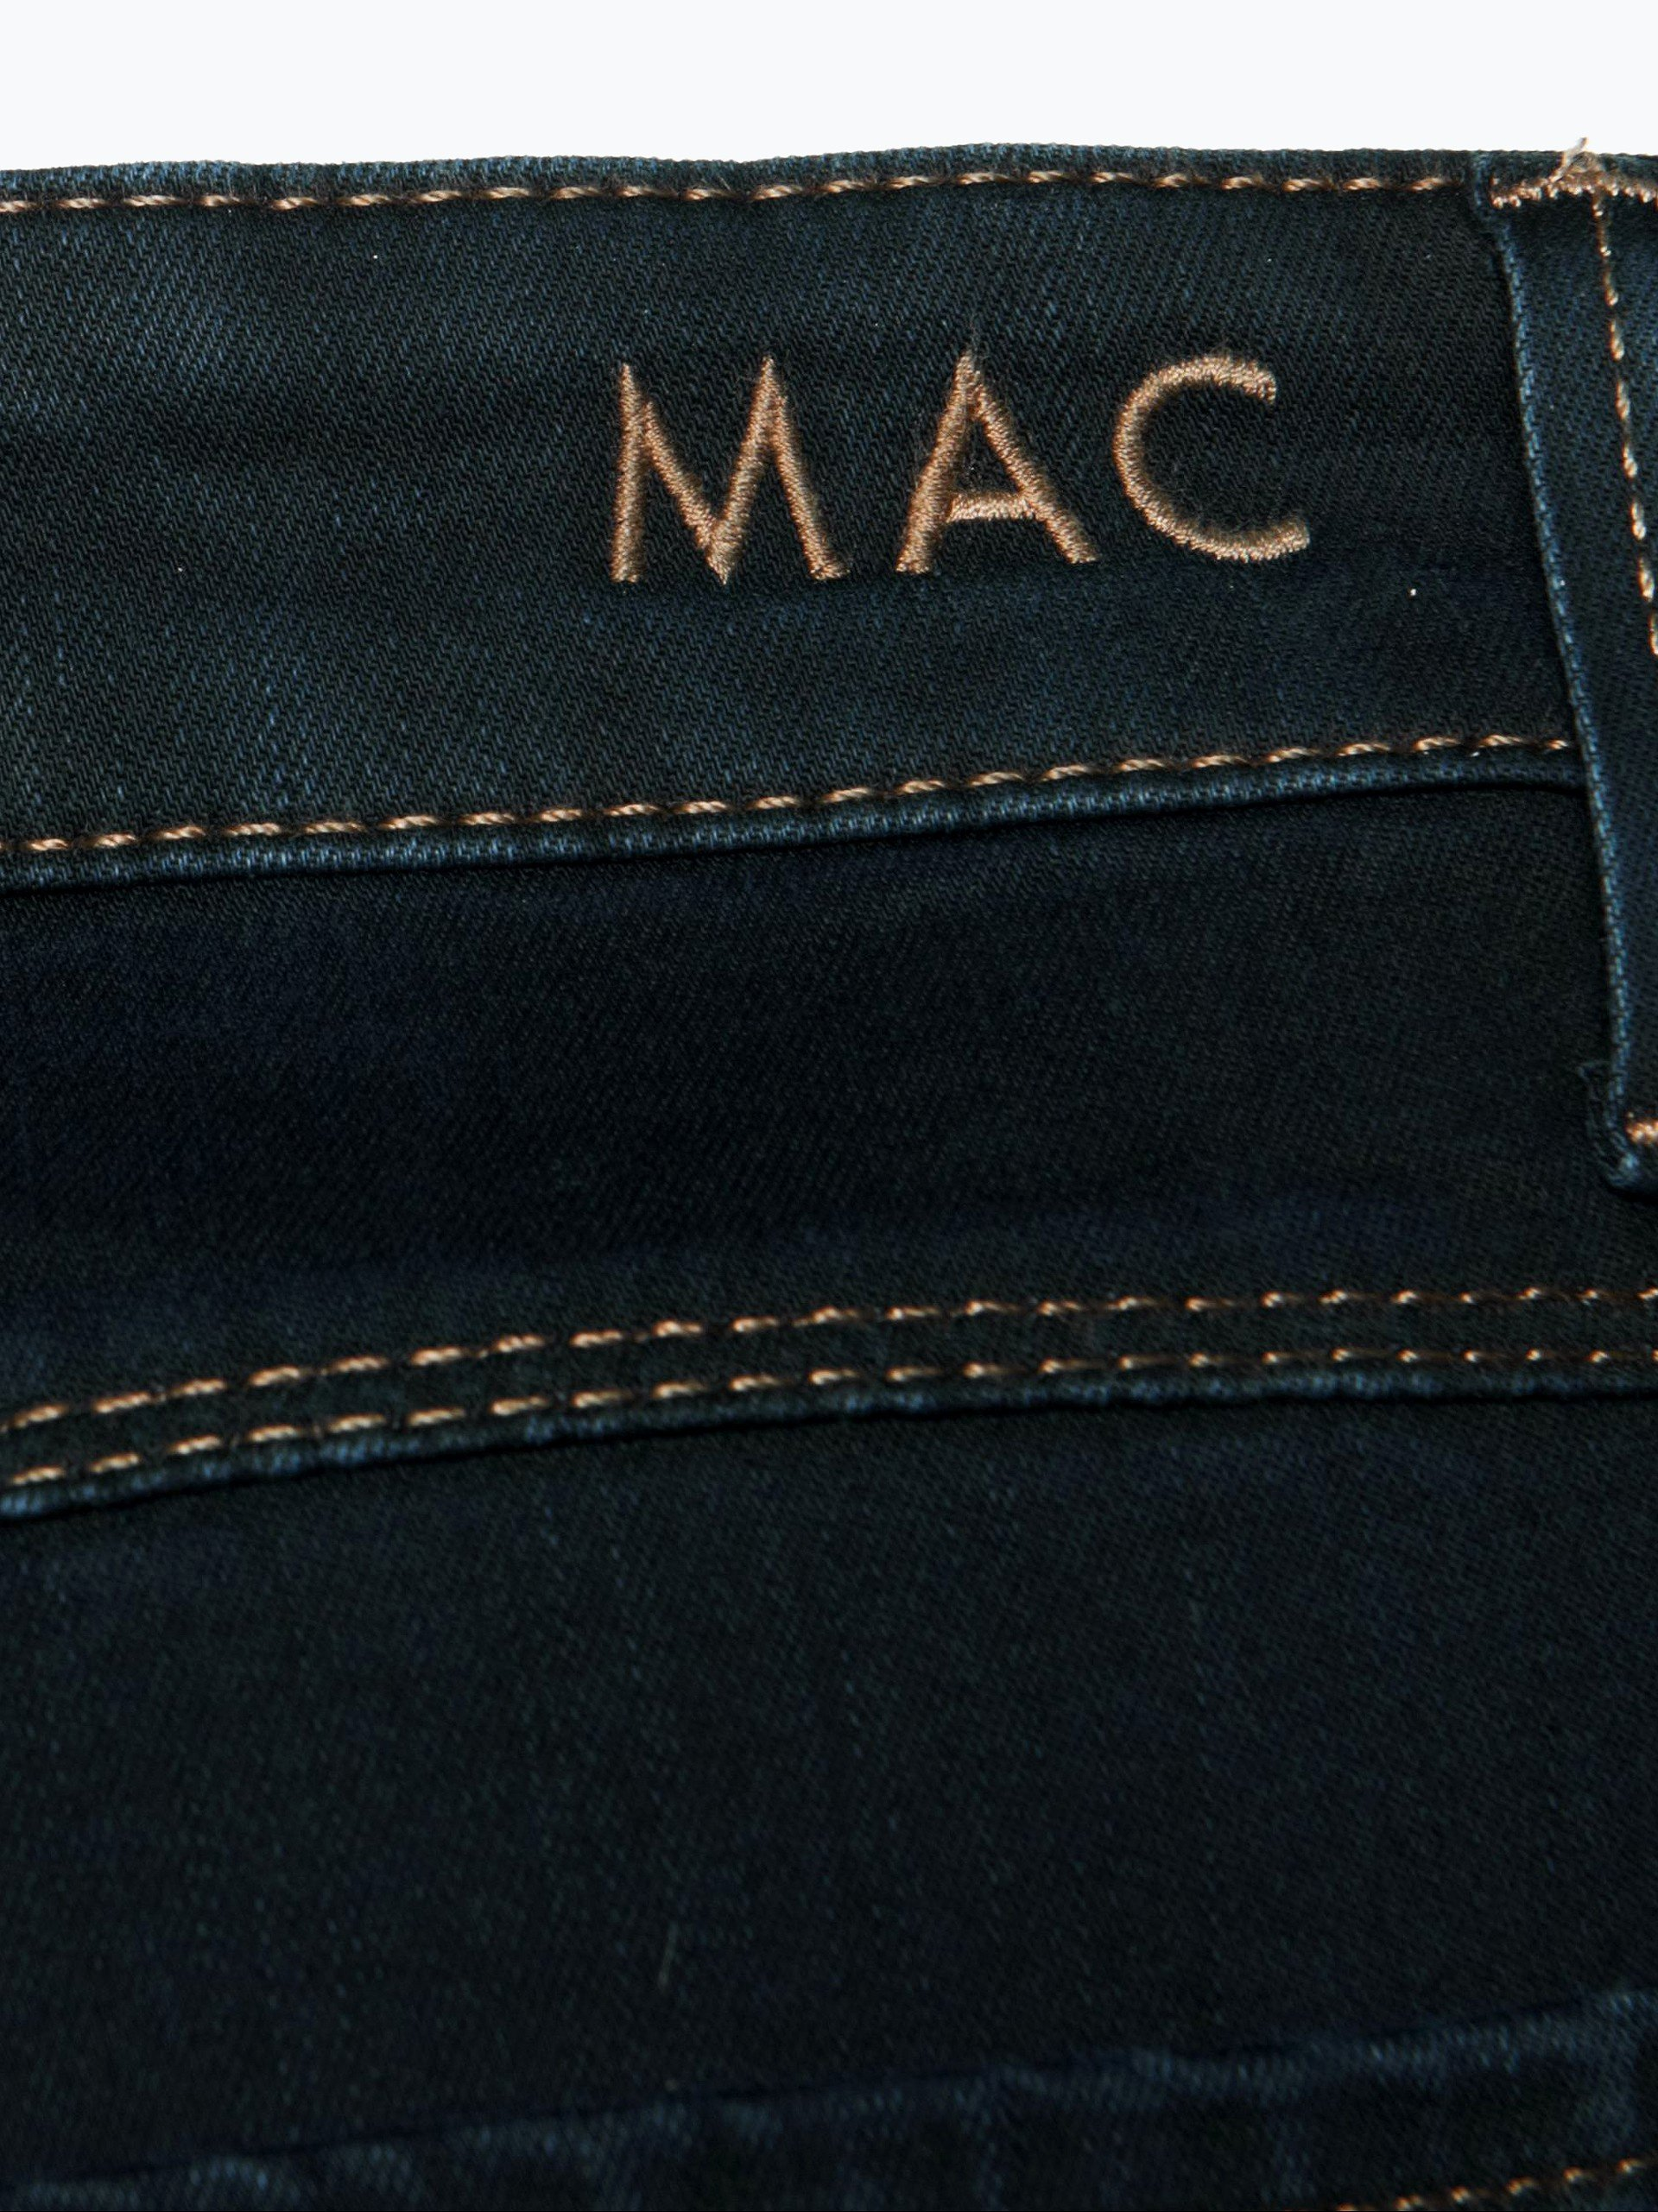 mac damen jeans melanie rinsed uni online kaufen peek. Black Bedroom Furniture Sets. Home Design Ideas